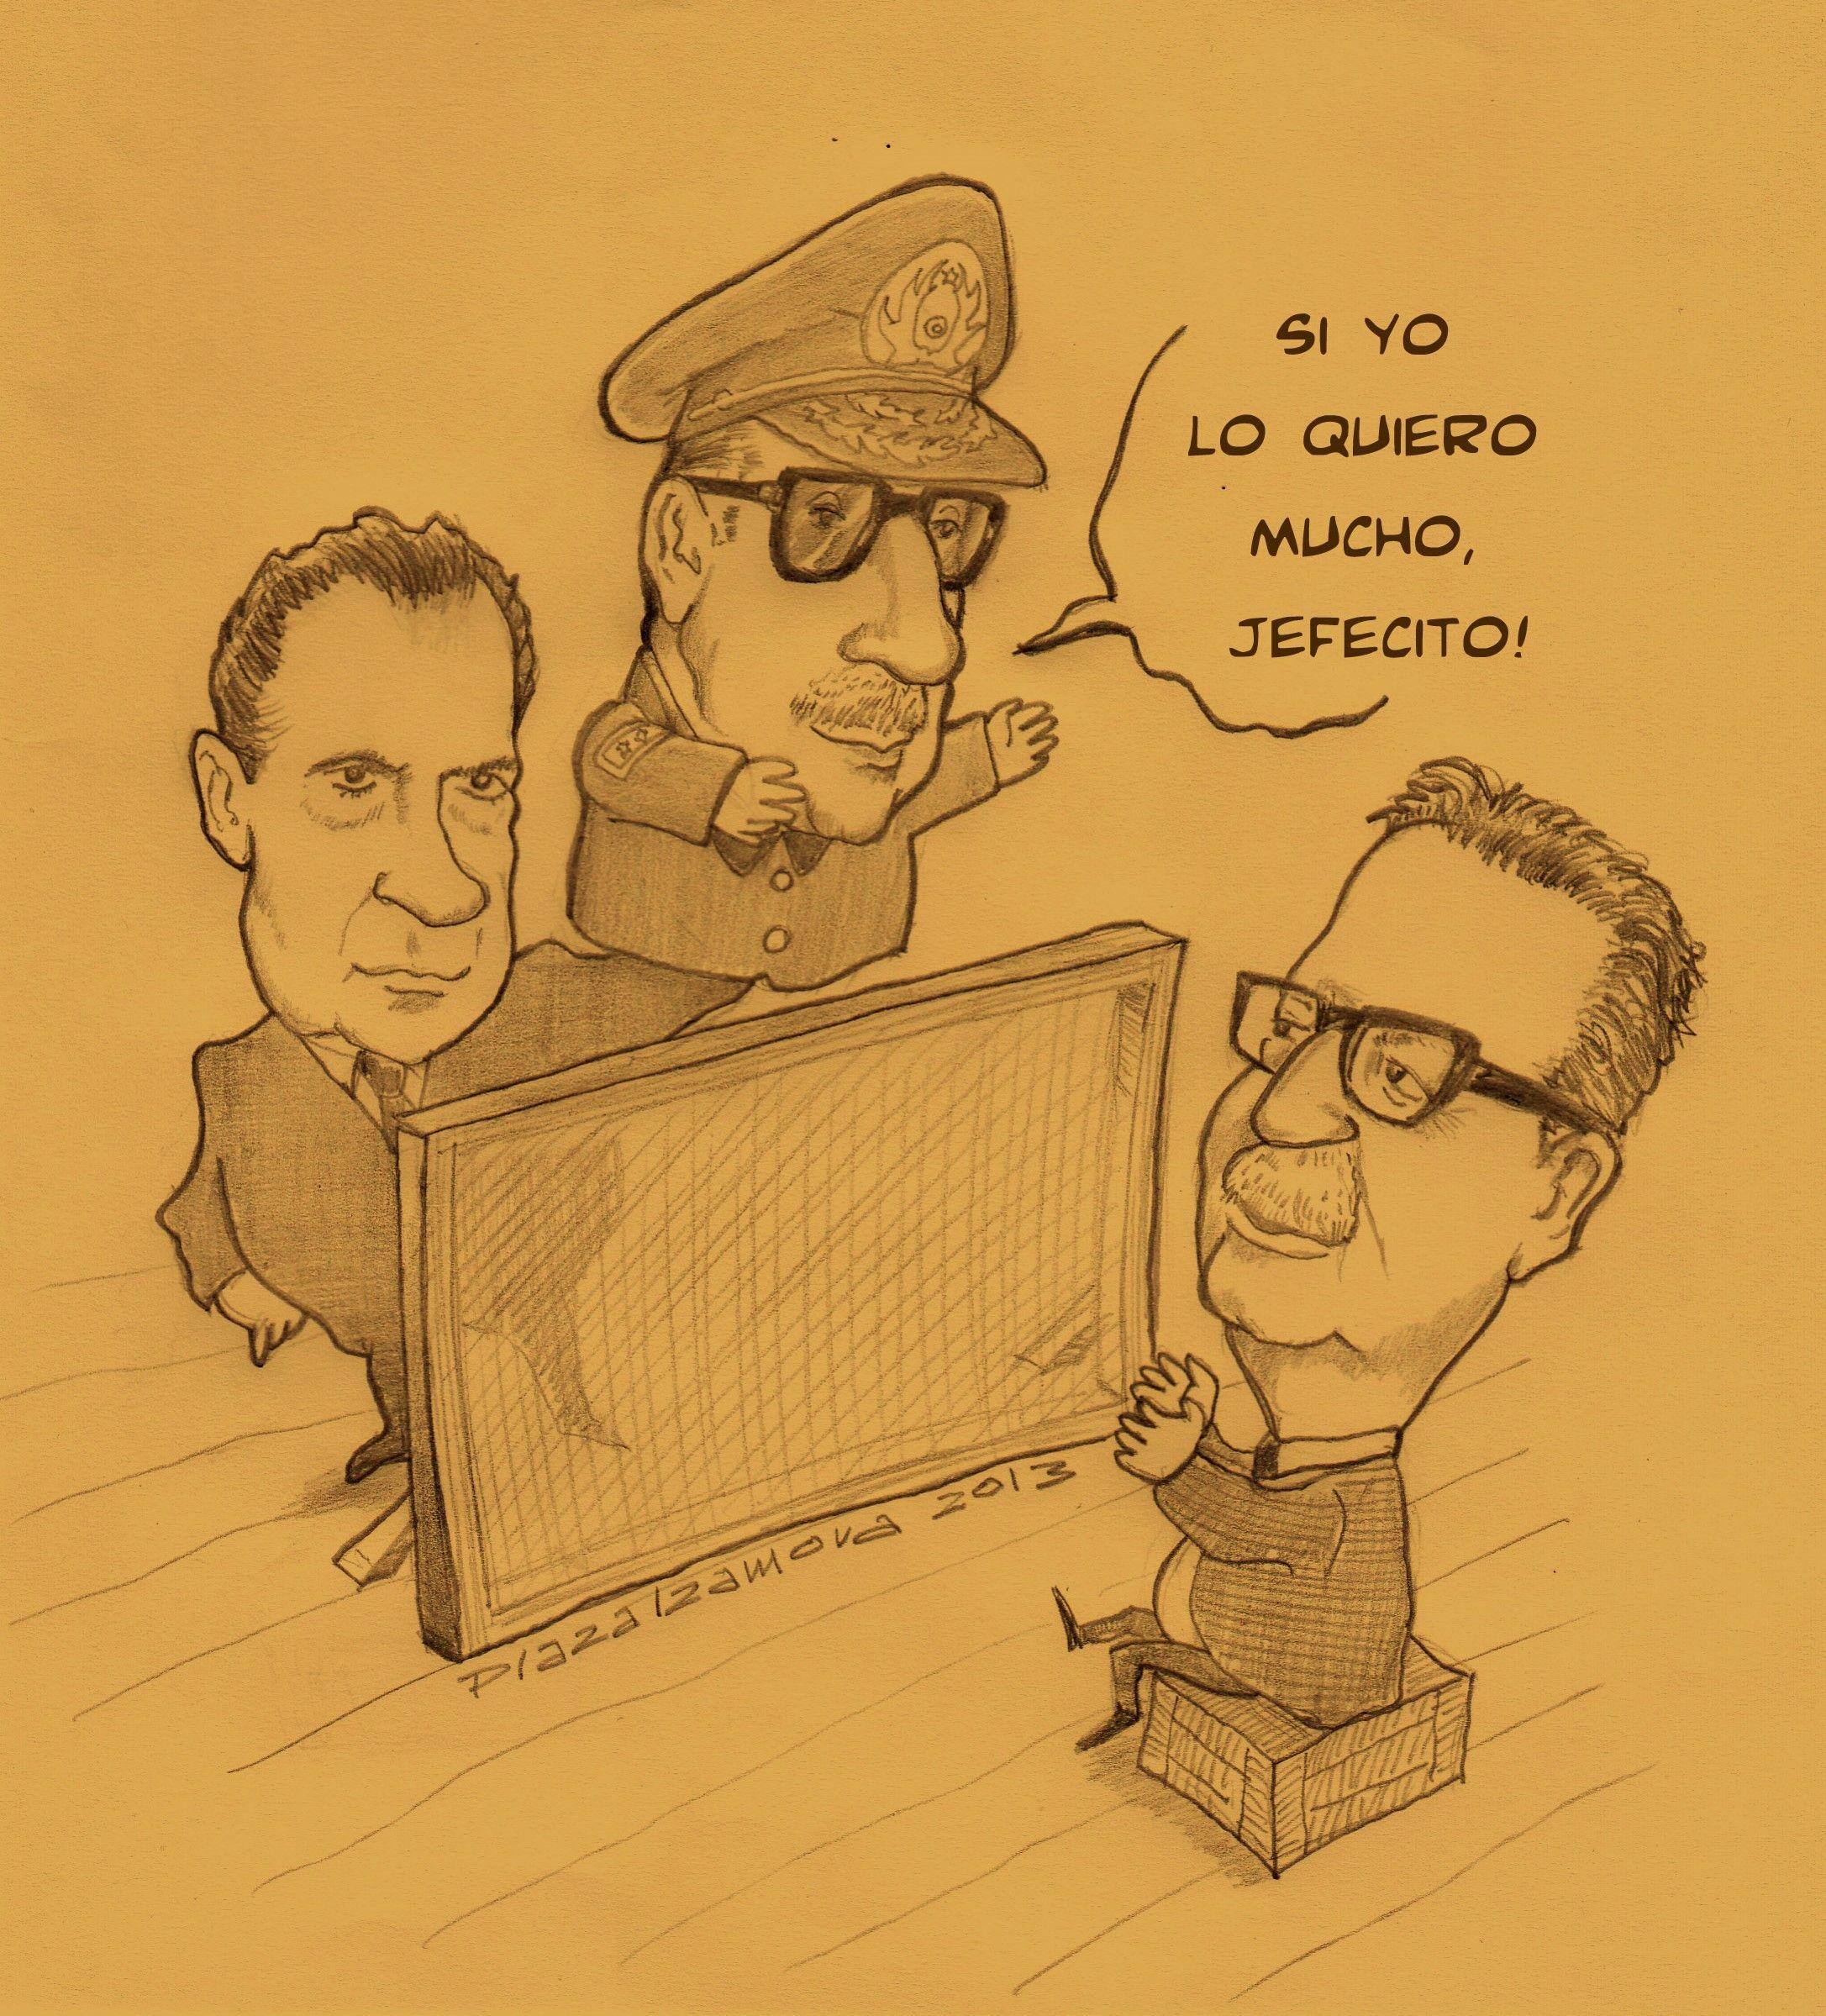 Caricatura Humor Grafico Pinochet Allende Y Nixon Humor Nixon Male Sketch